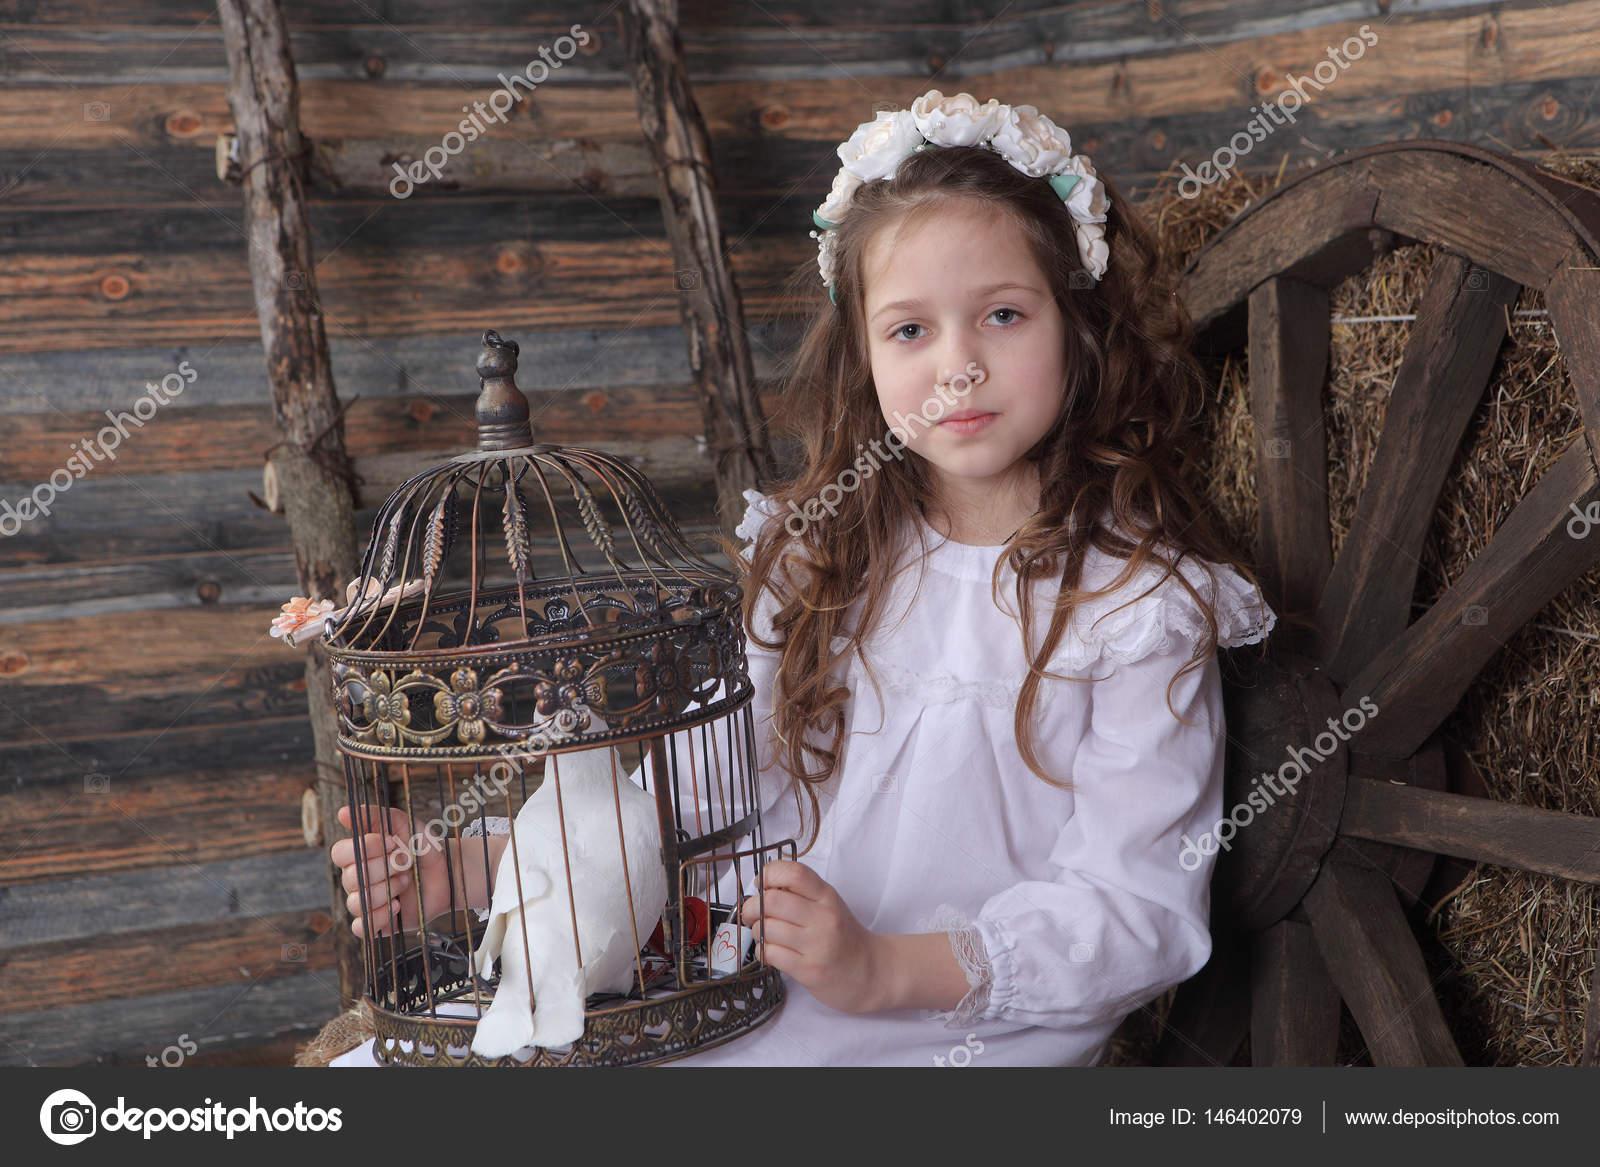 80f4203fcf40 Κορίτσι με ένα στεφάνι και ένα λευκό φόρεμα που κρατά ένα κλουβί με έναν  ζωντανό λευκό dov — Εικόνα από ...